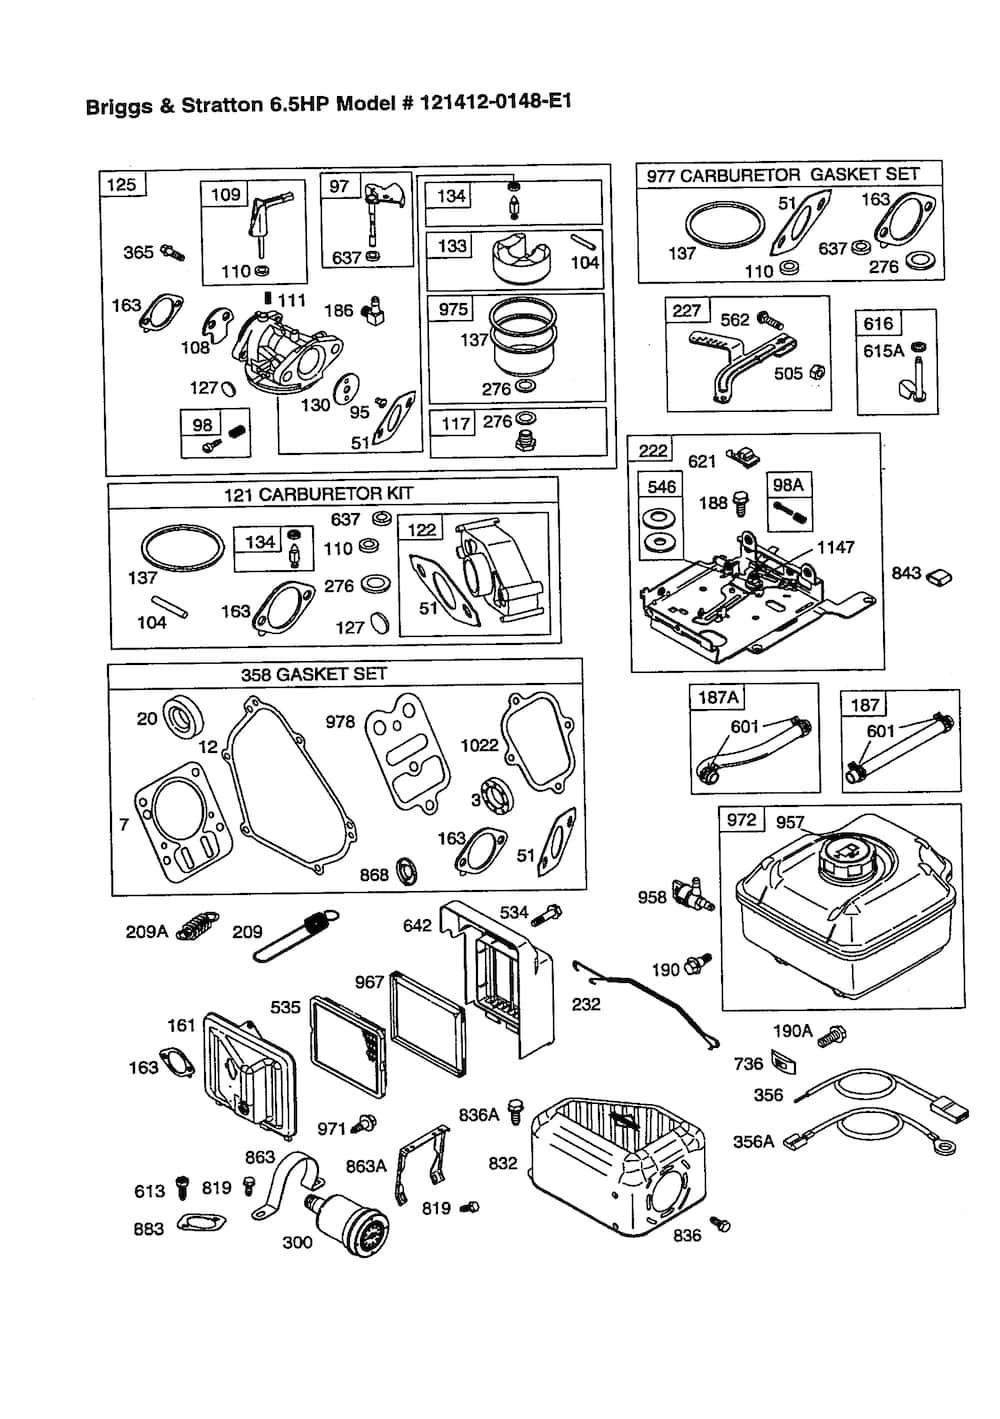 6.5 Briggs Stratton Carburetor Diagram Briggs and Stratton Carburetor Parts Diagram Of 6.5 Briggs Stratton Carburetor Diagram